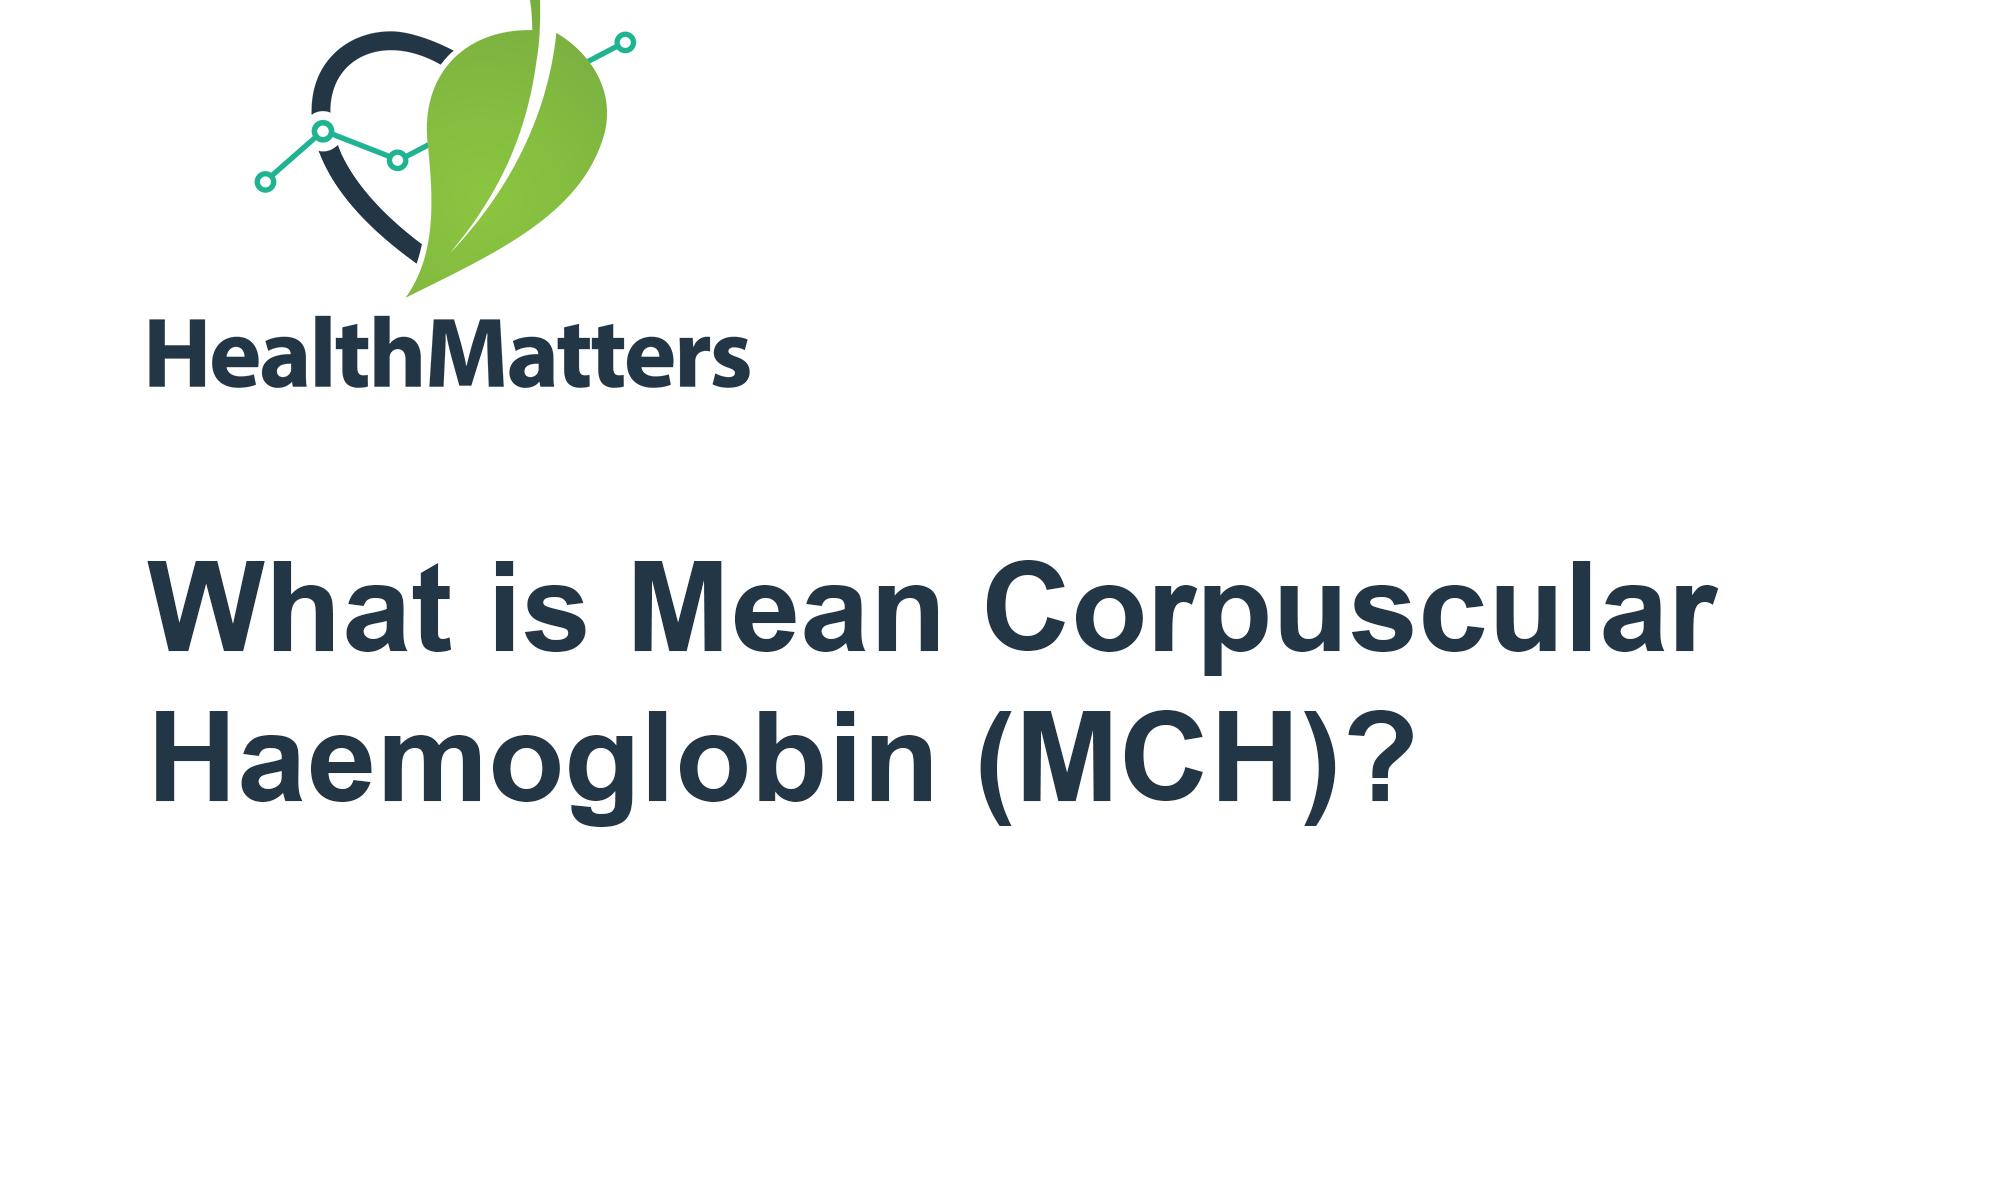 What is Mean Corpuscular Haemoglobin